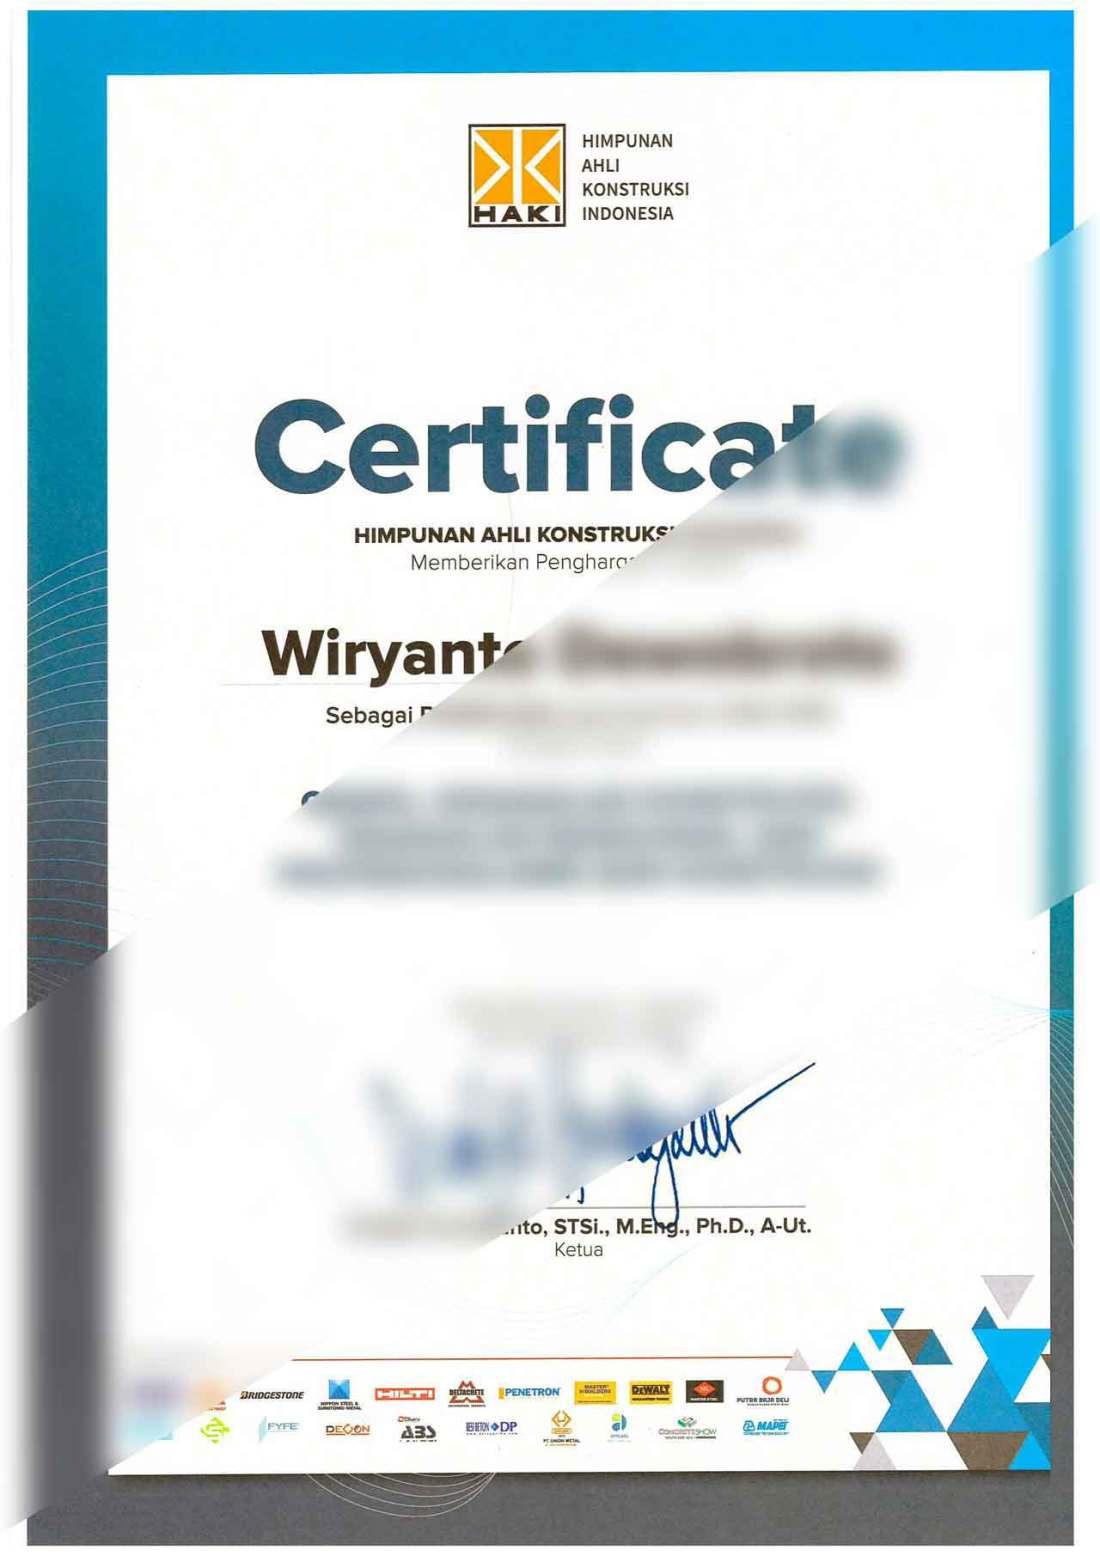 _Certificate-HAKI-2018-Pembicara-Wiryanto